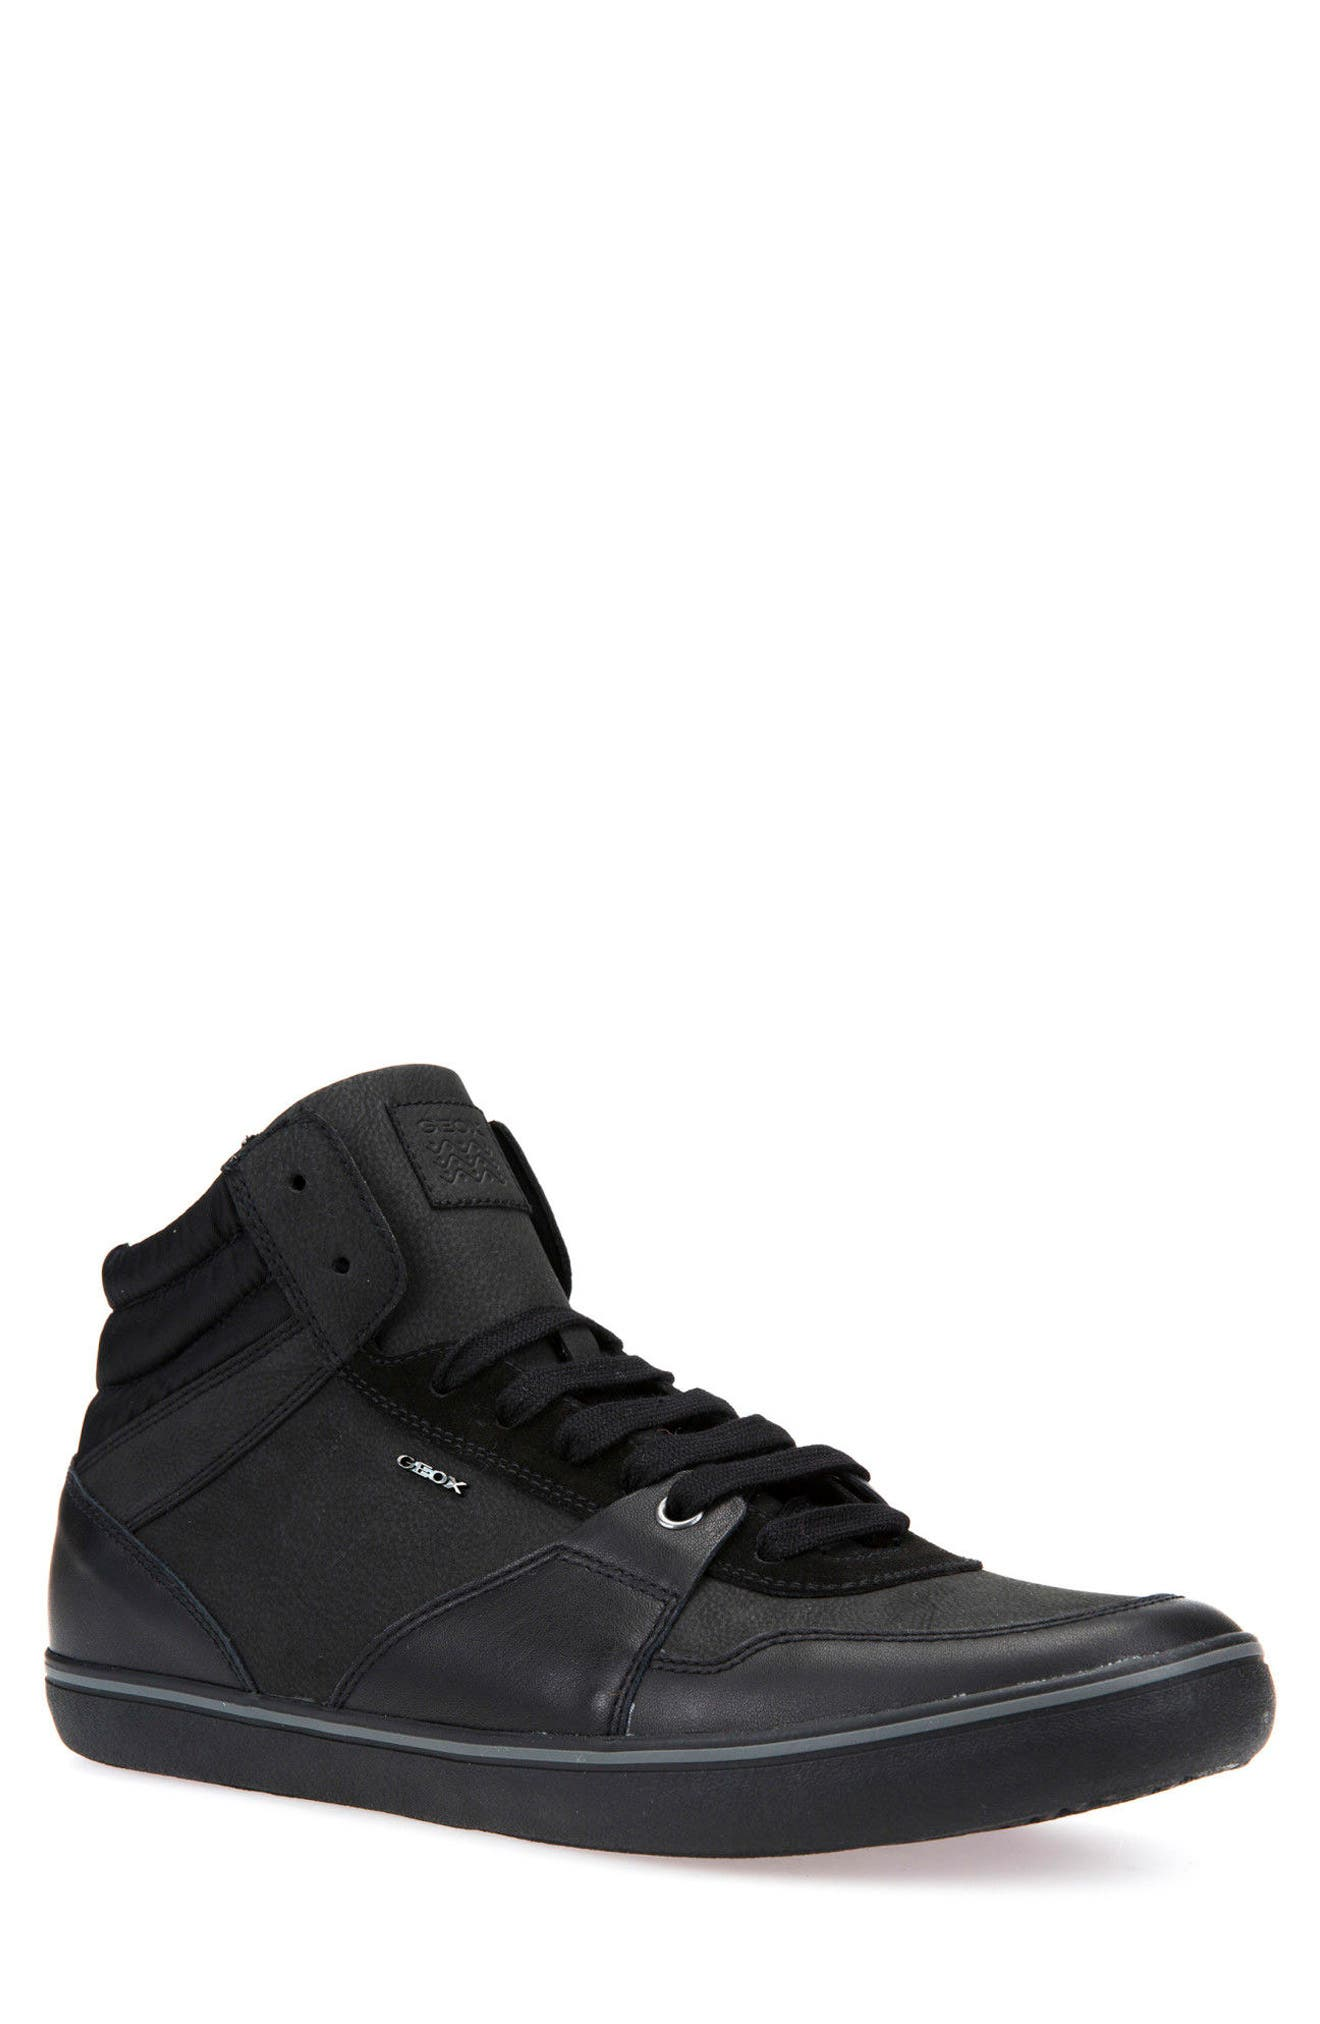 Box 31 High Top Sneaker,                             Main thumbnail 1, color,                             Black